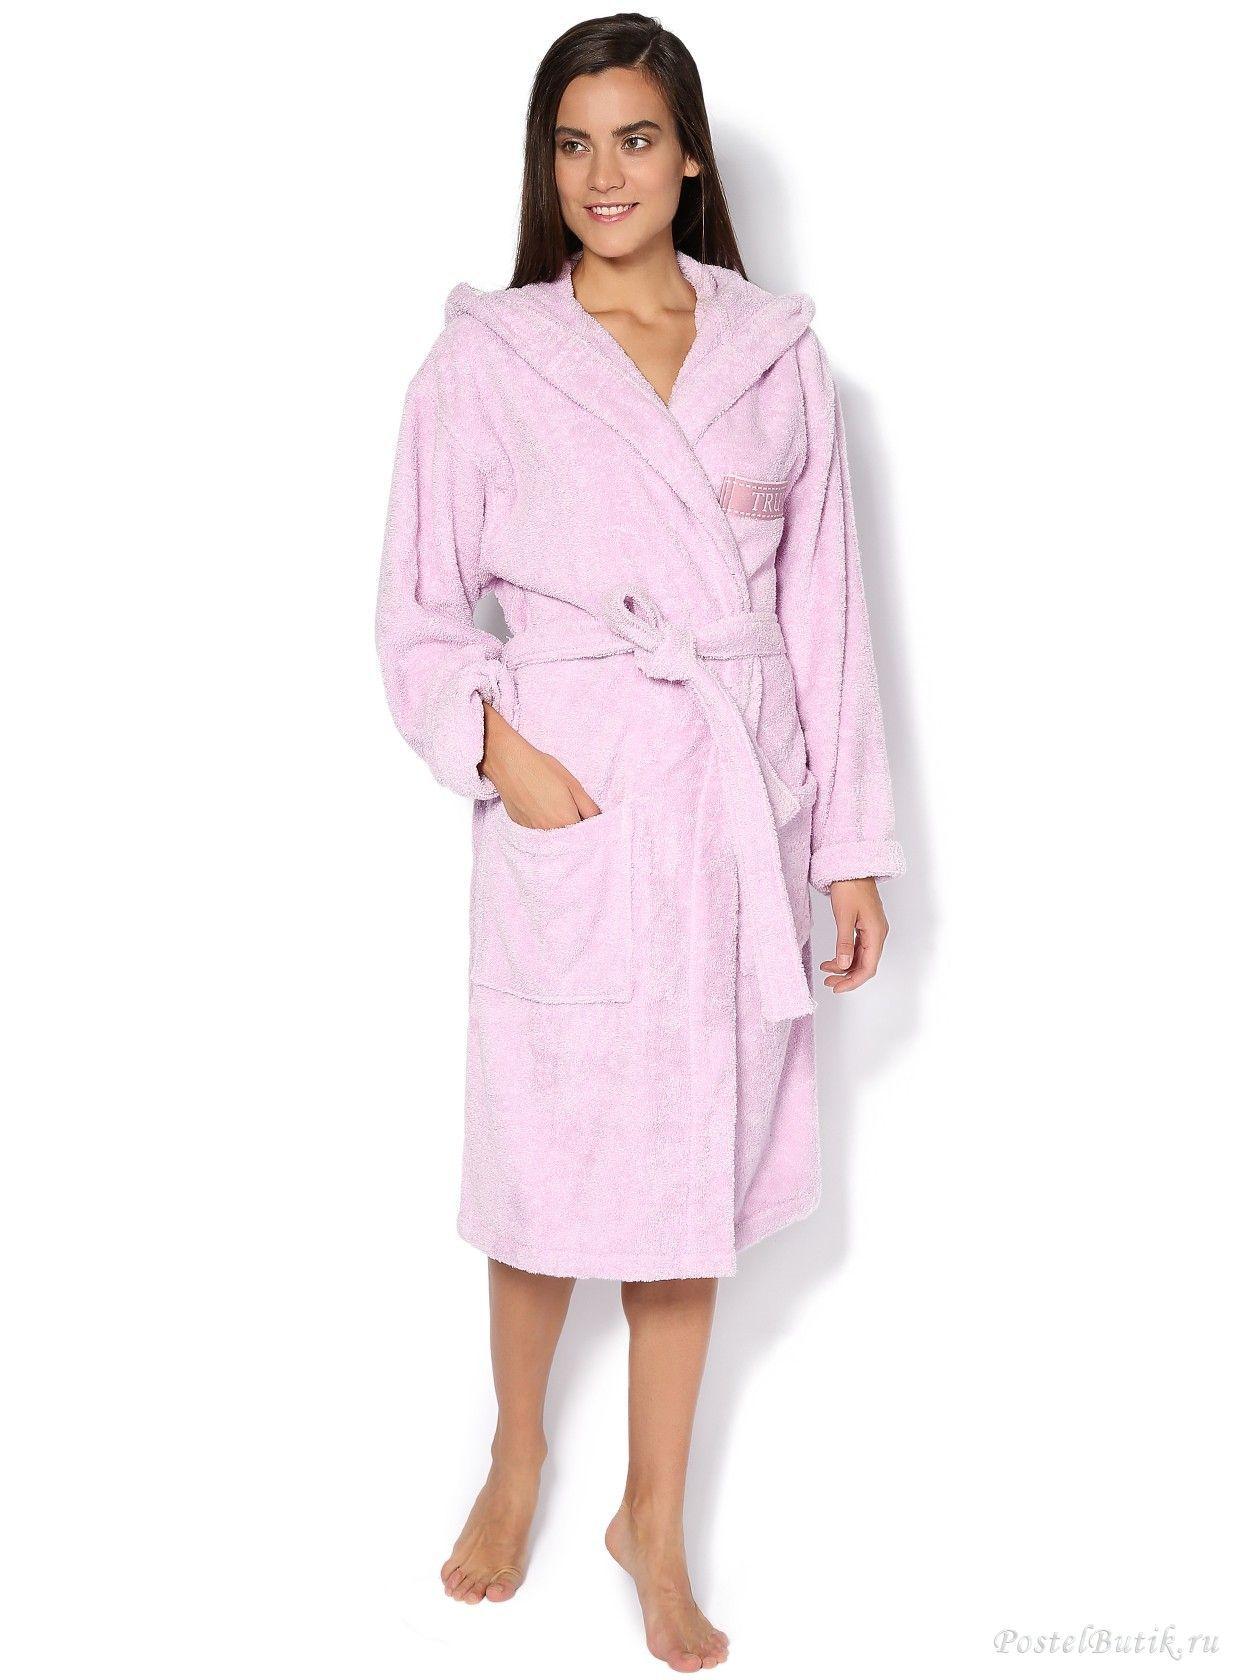 Халаты Халат махровый Trussardi Golf розовый elitniy-halat-golf-rozoviy-ot-trussardi-italiya.jpg